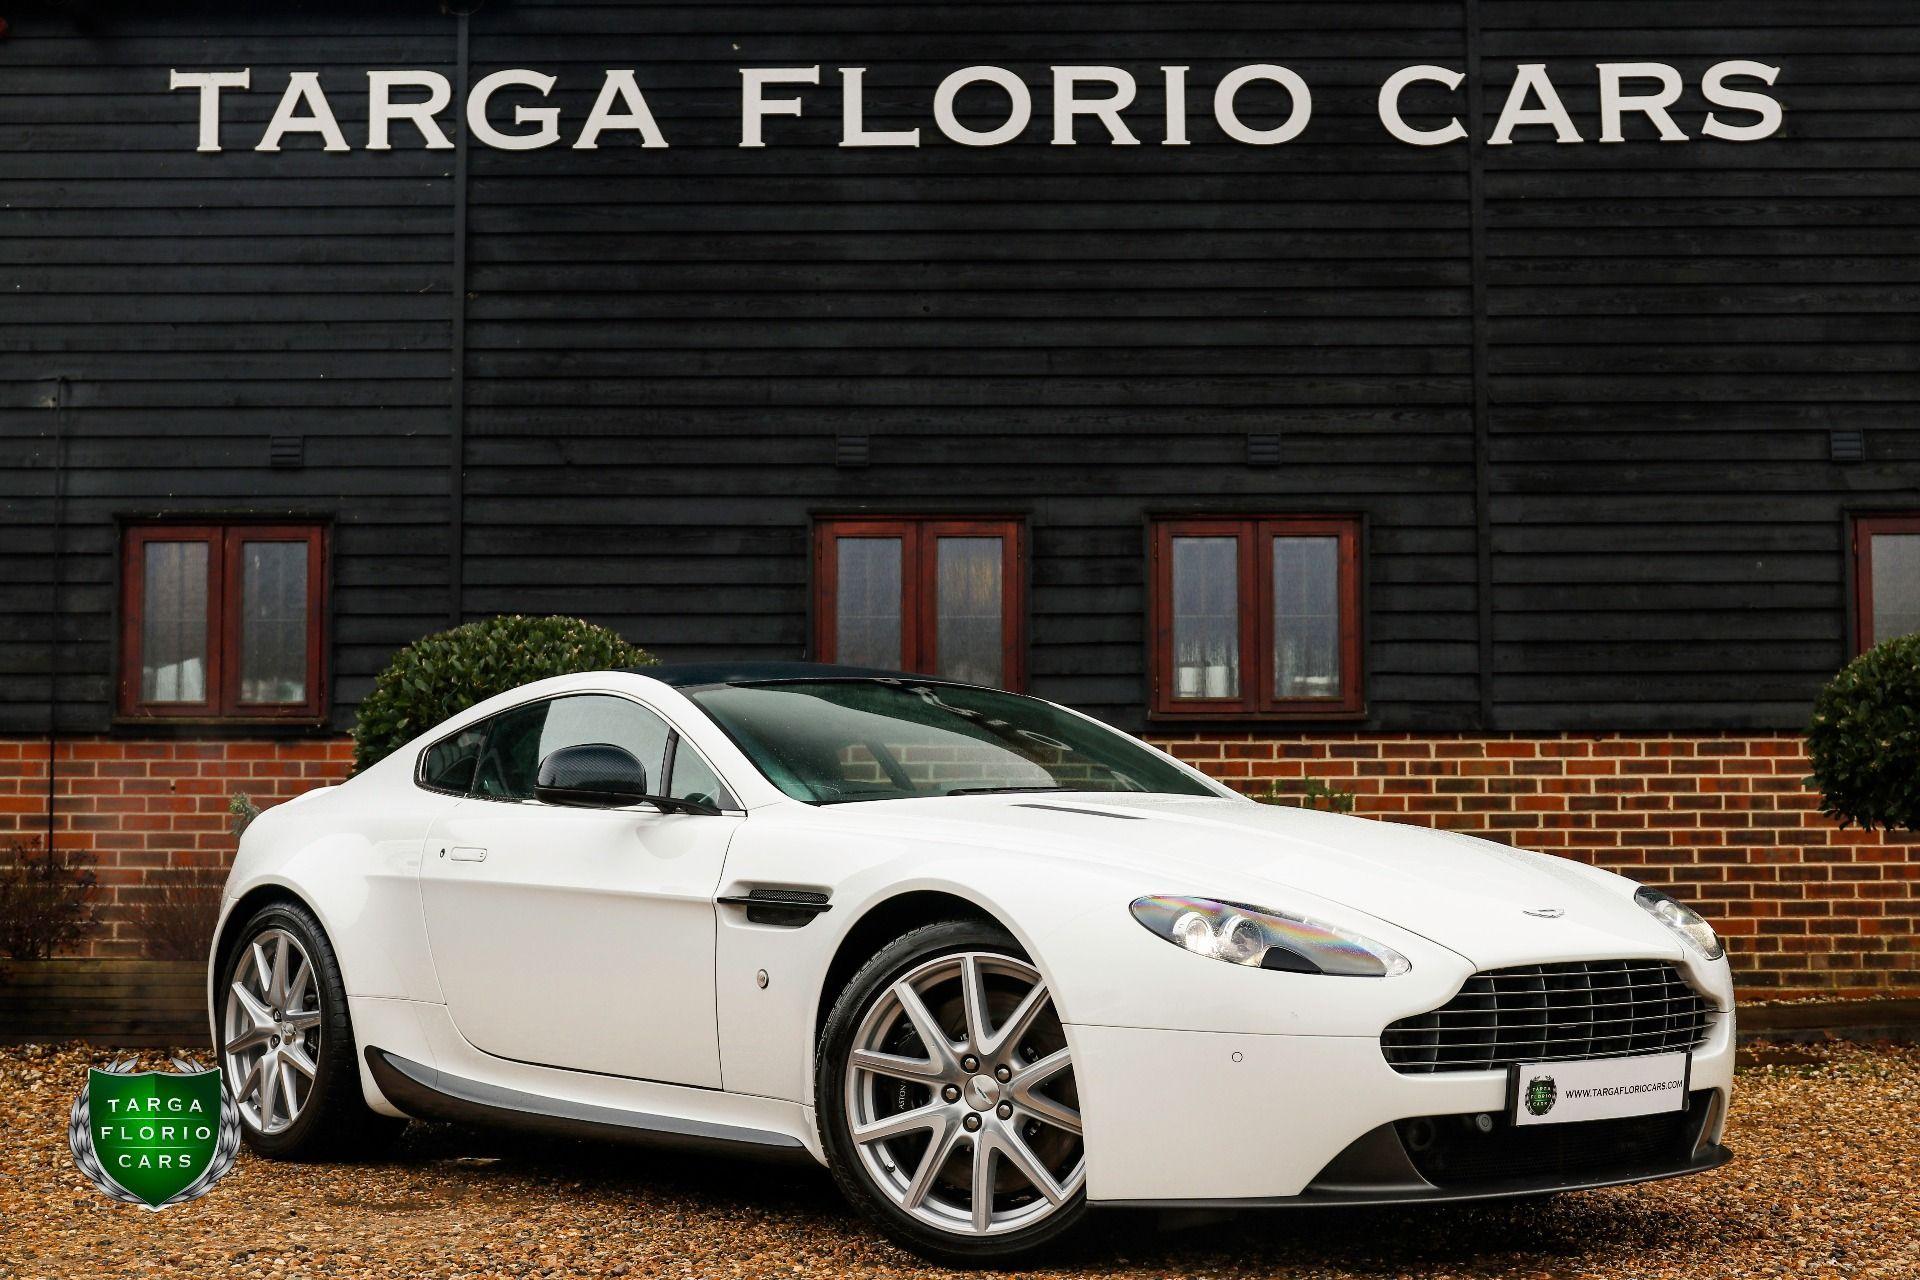 White Aston Martin Vantage Used Cars For Sale Autotrader Uk